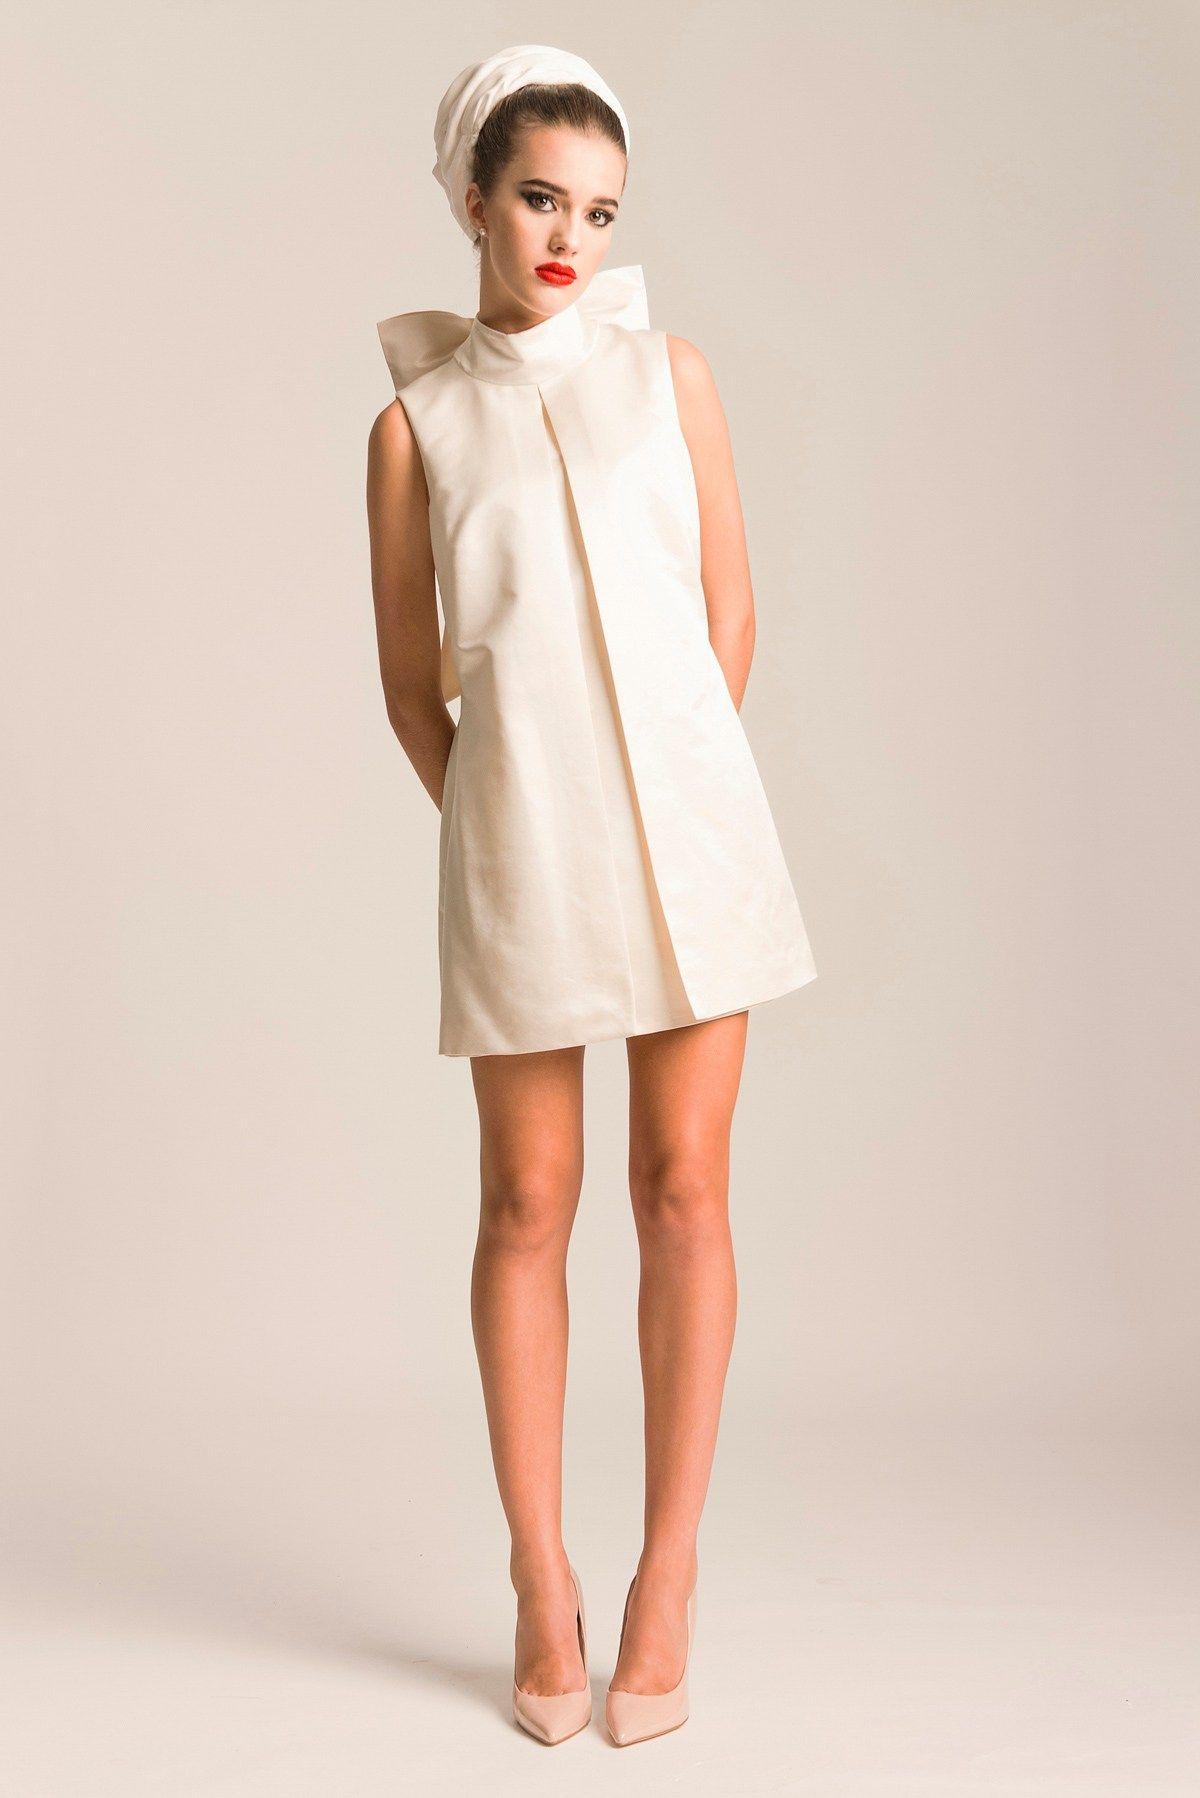 Adelais london modern vintage glamorous and chic bridal fashion